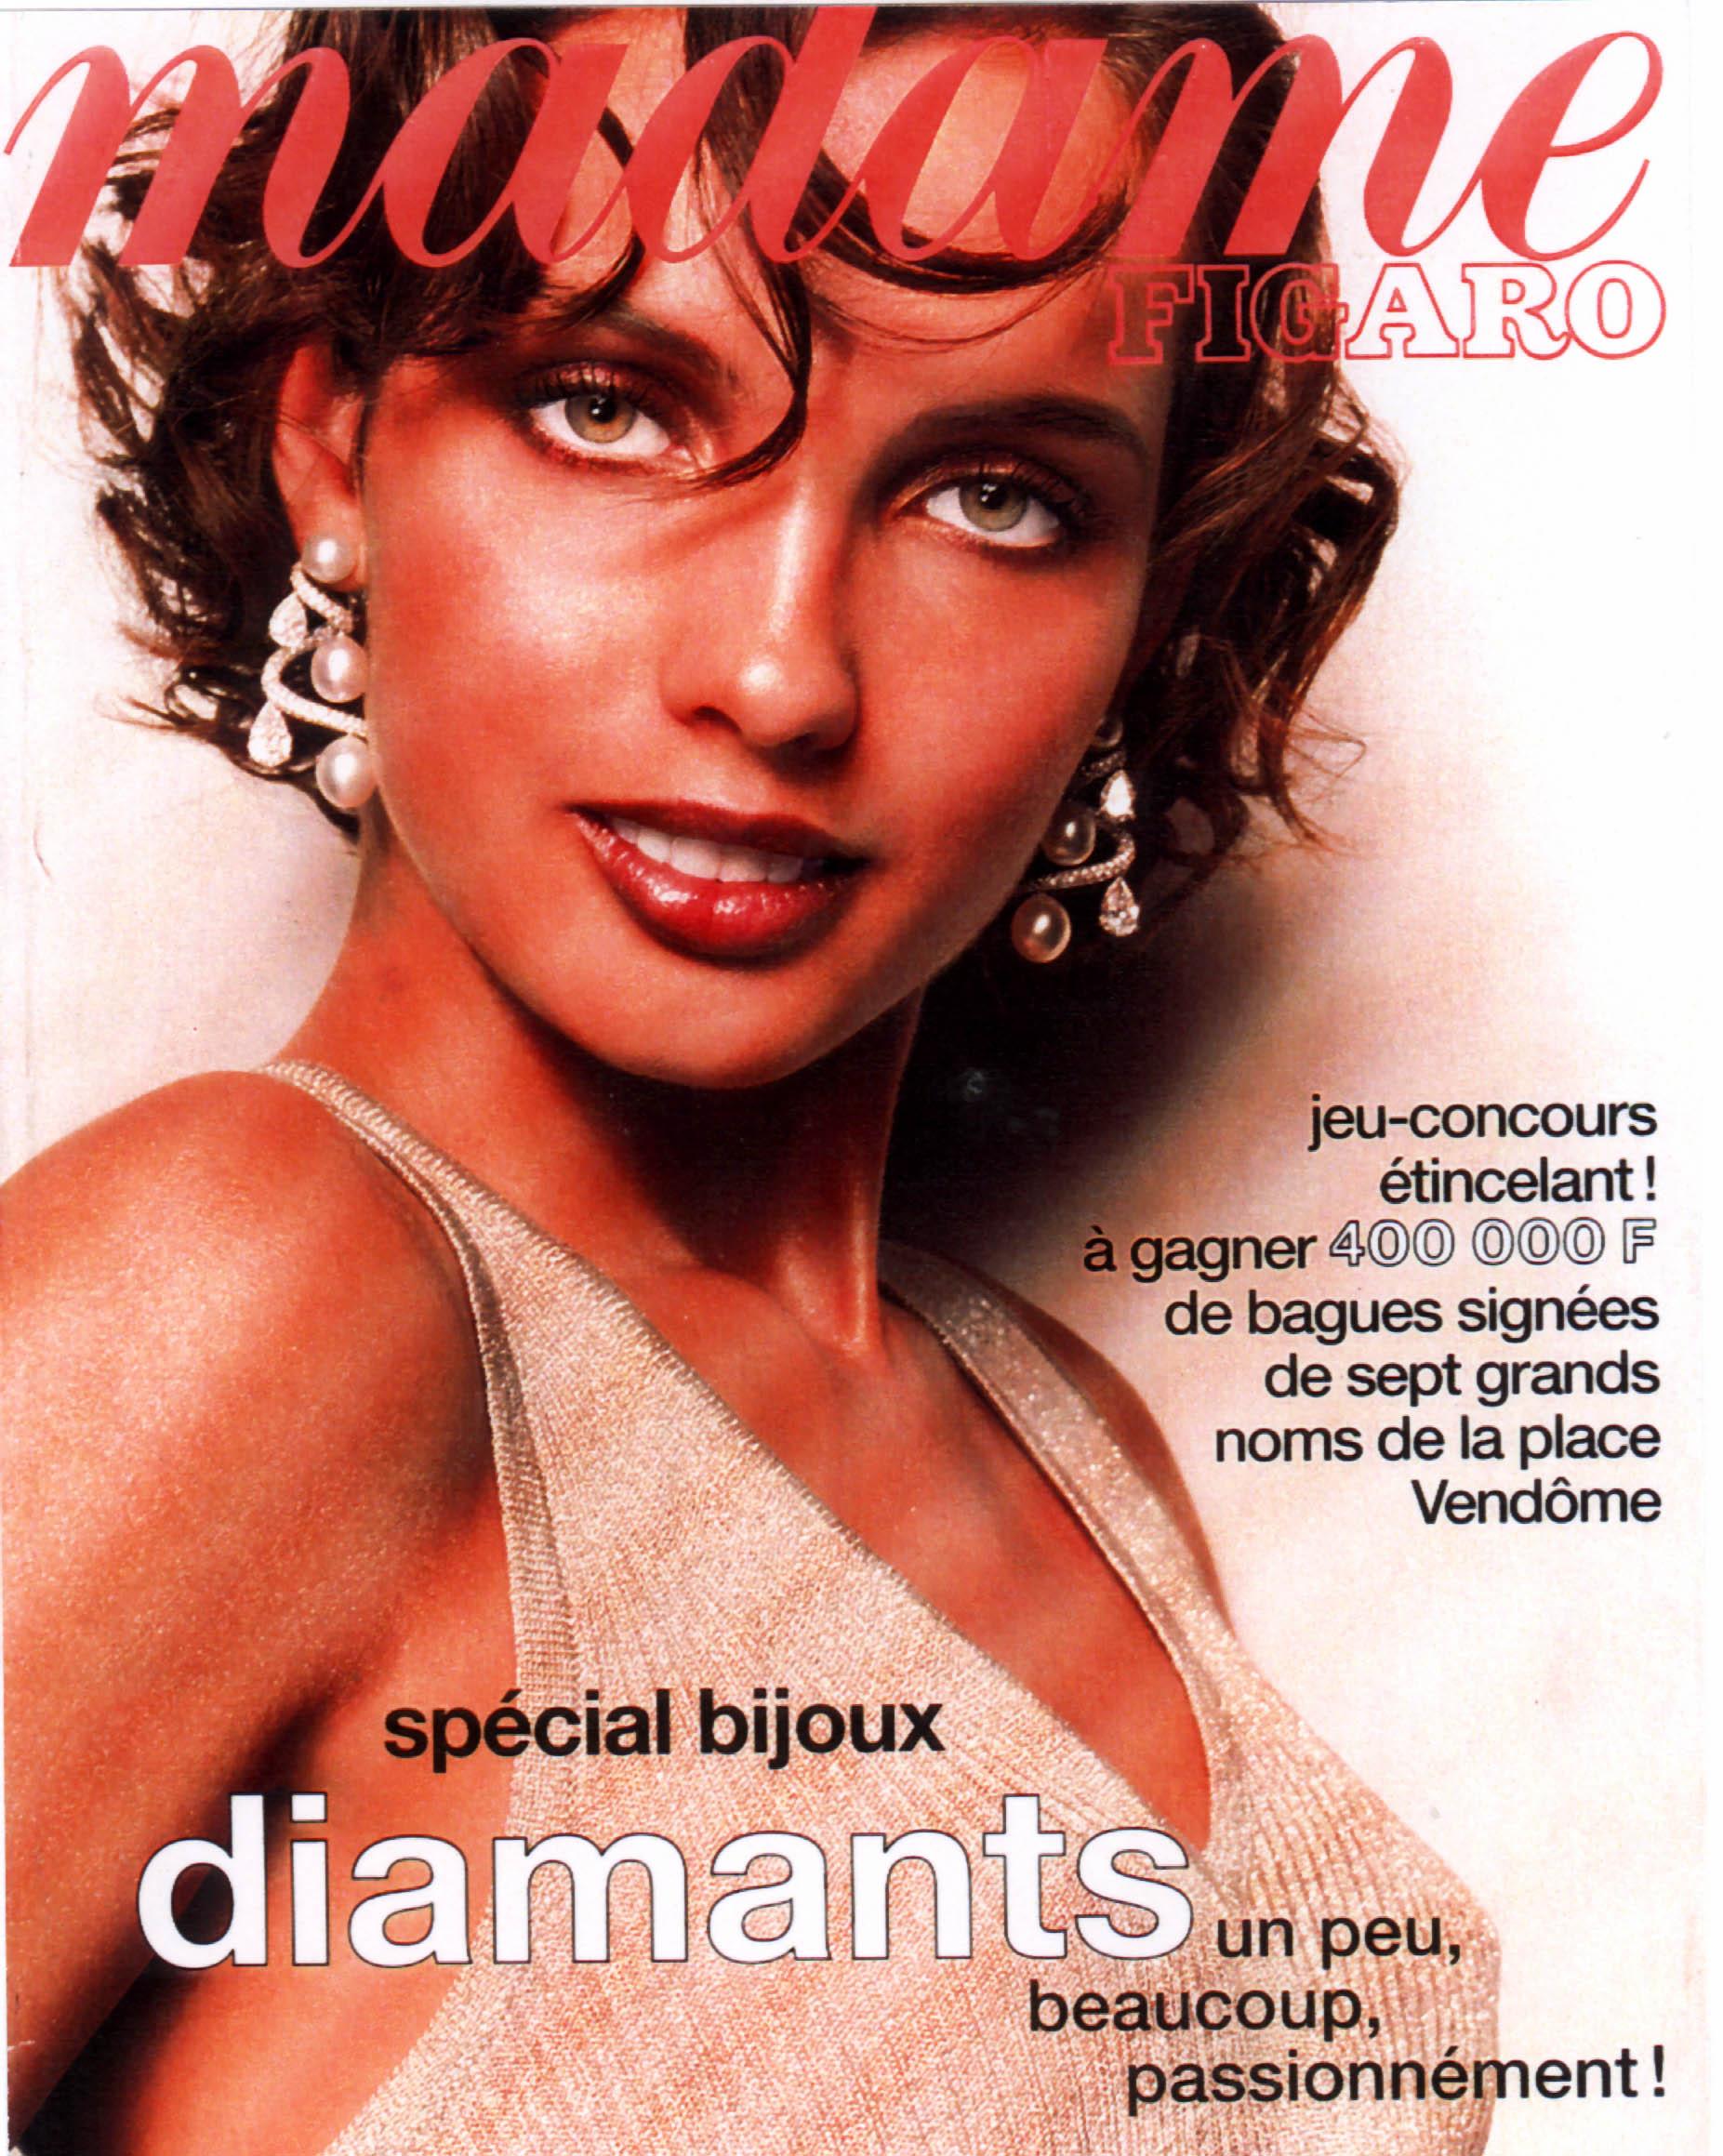 1998 Figaro Madame Sam 12 dec 1998 couve.jpg